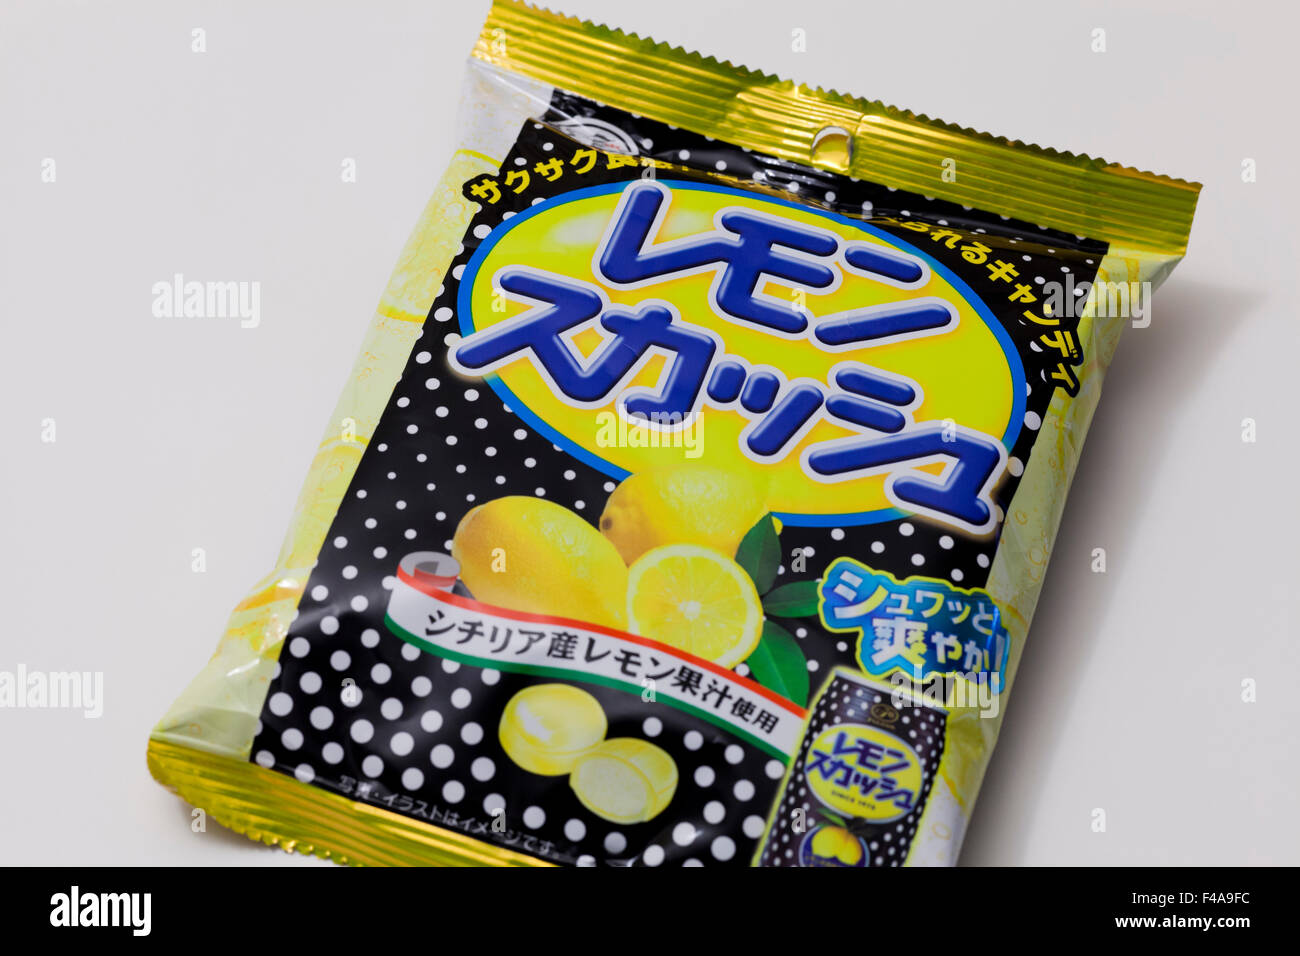 Fujiya Lemon Squash-Süßigkeiten-Paket Stockfoto